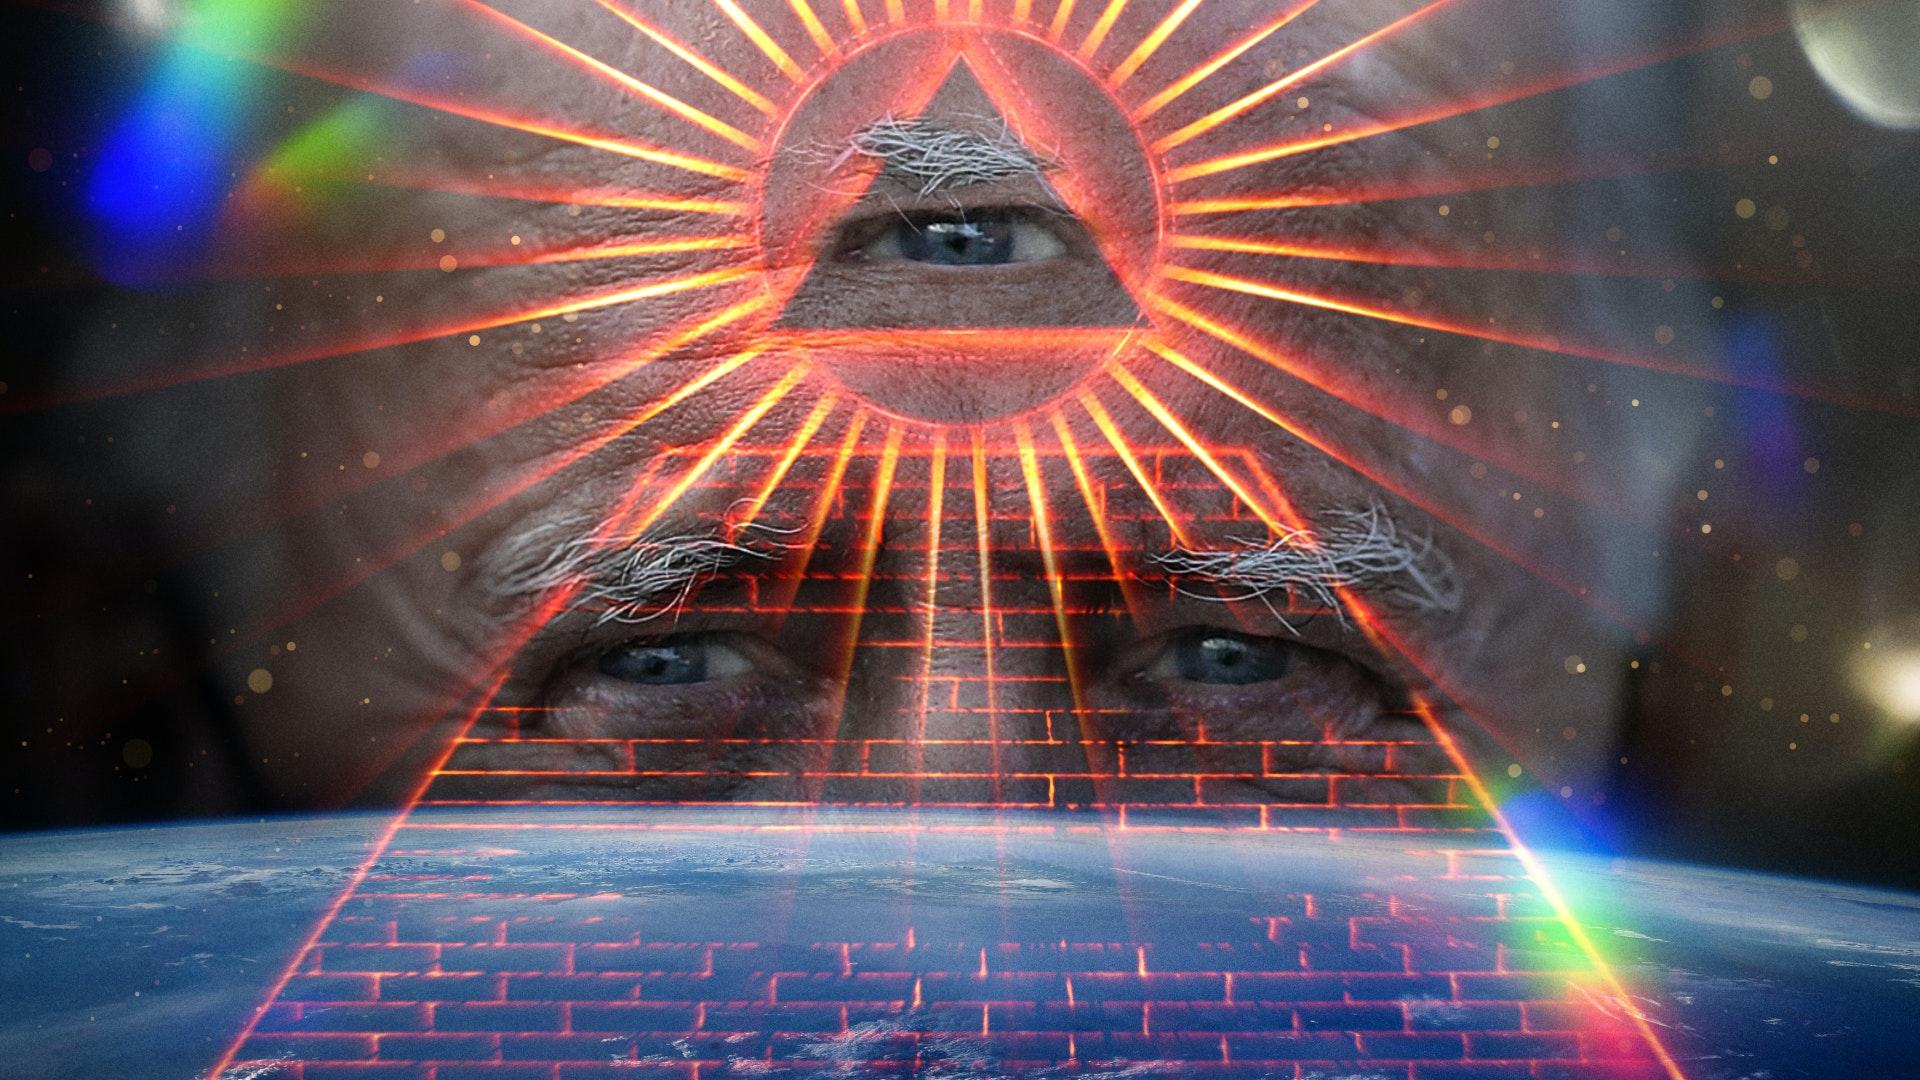 Ep. 1229 - Biden's New World Order